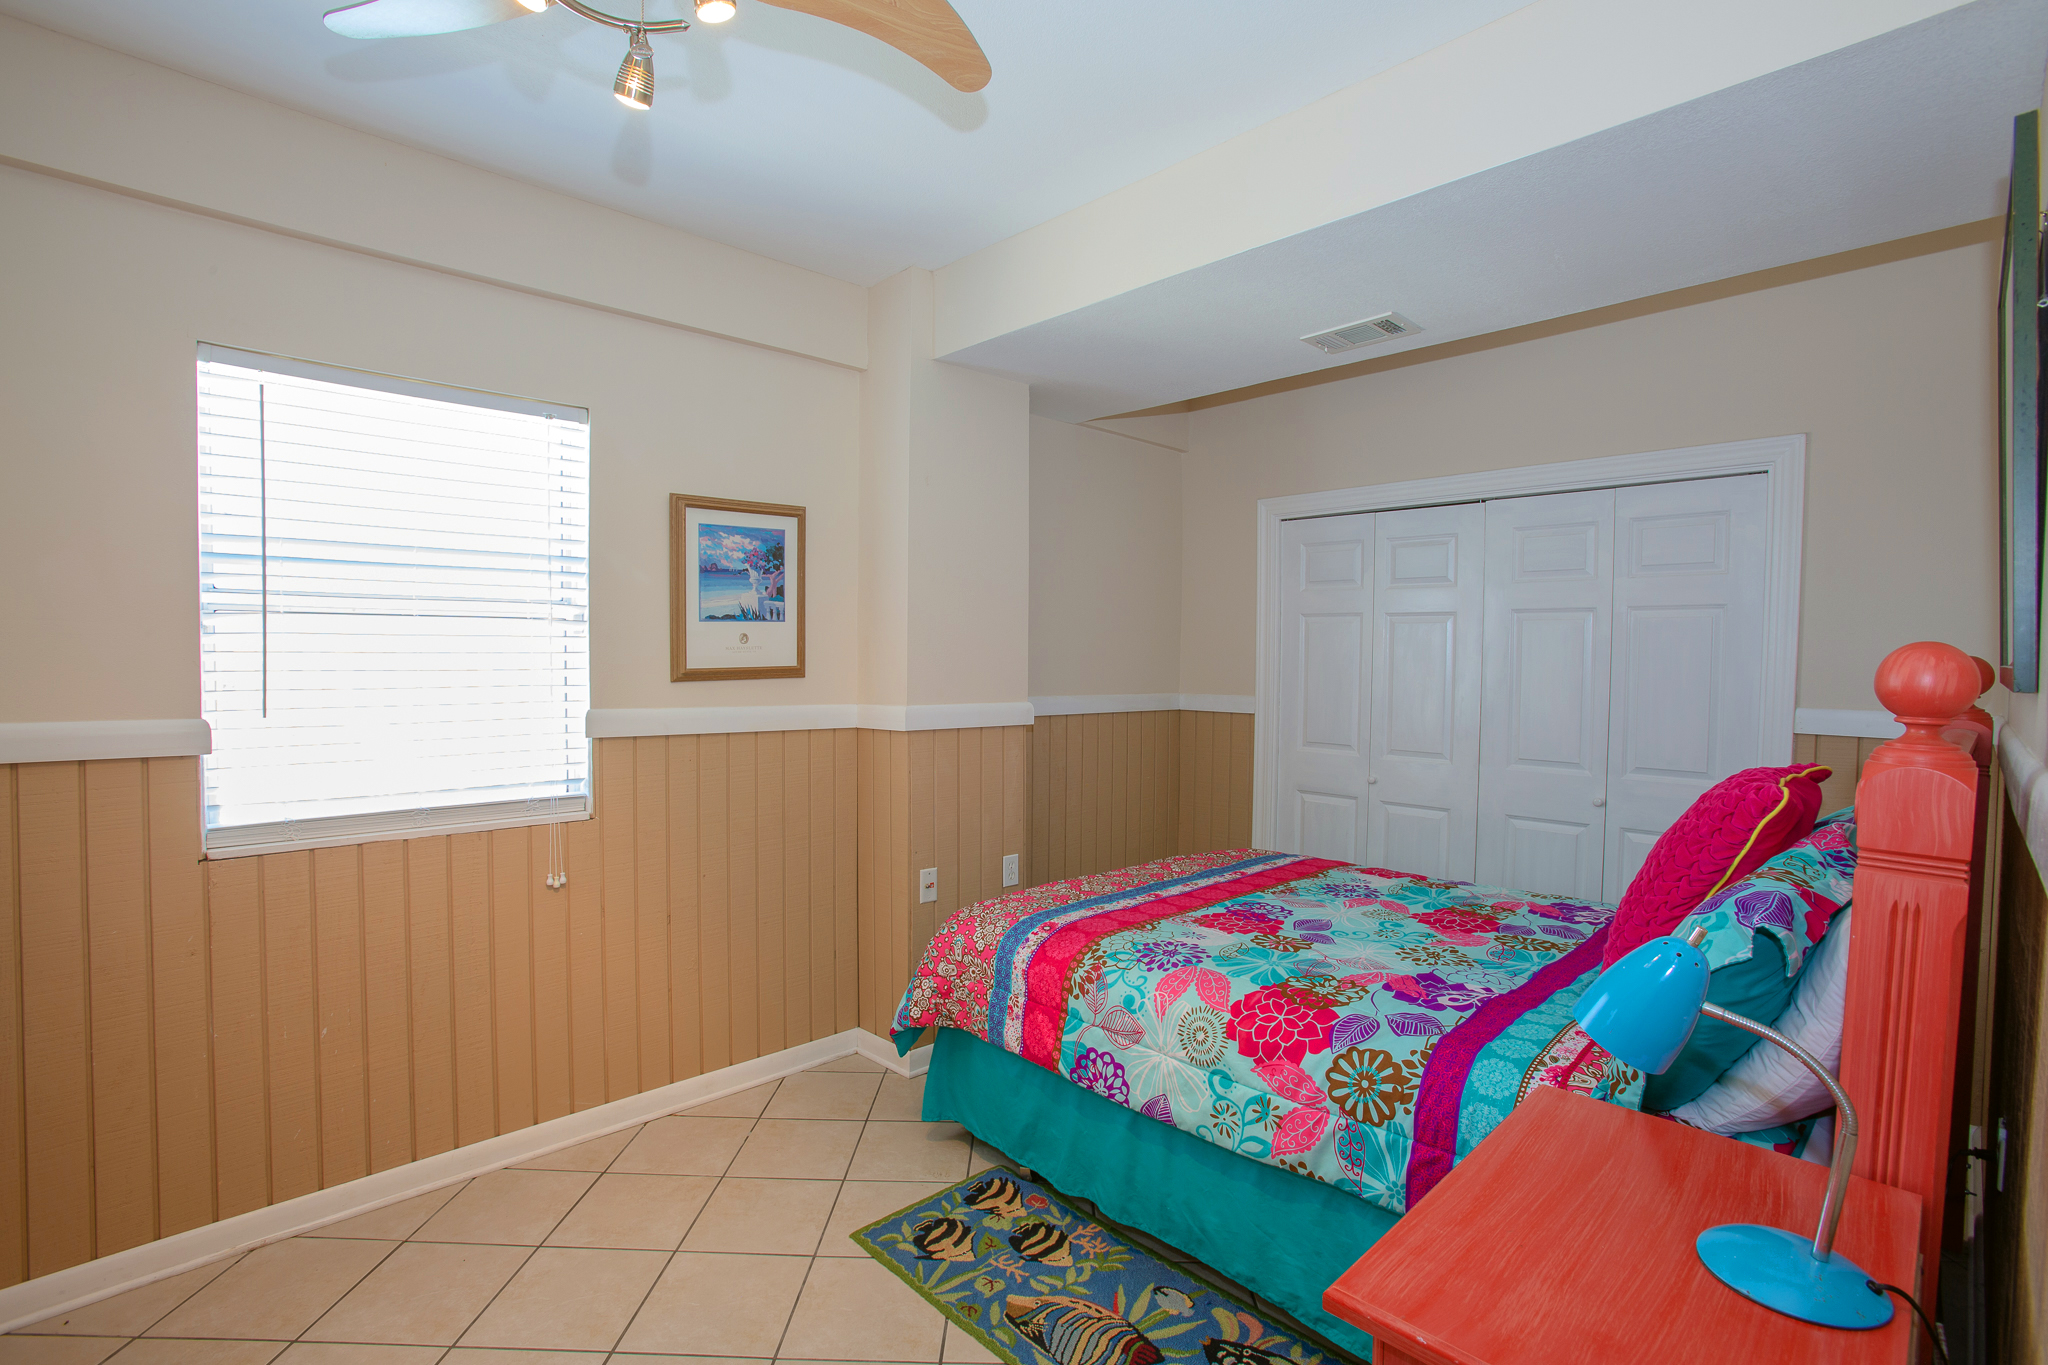 Maldonado 1015 - Sea the Big Picture House/Cottage rental in Pensacola Beach House Rentals in Pensacola Beach Florida - #26